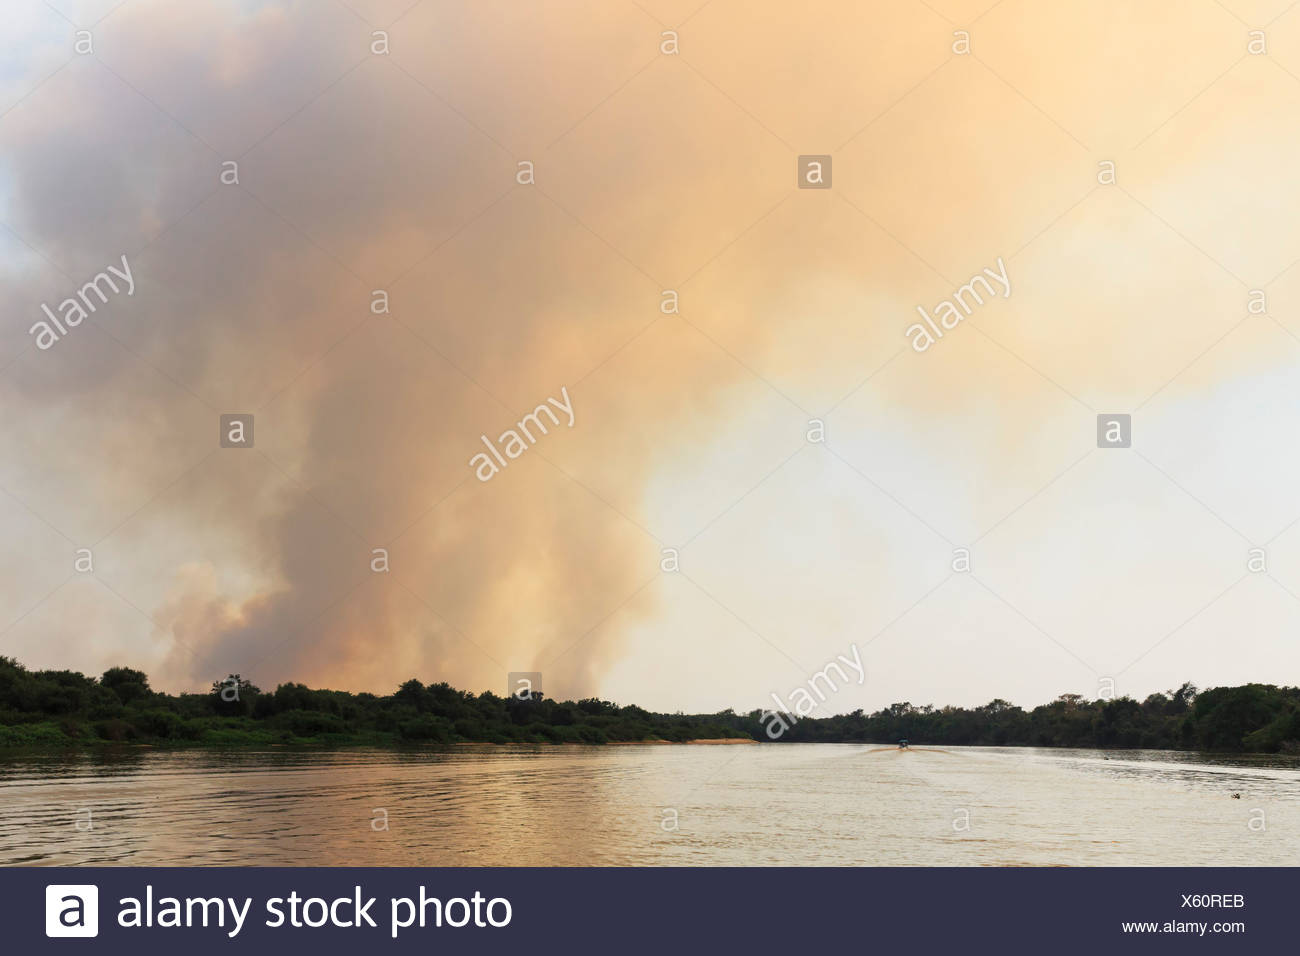 Brazil, Mato Grosso do Sul, Pantanal, Cuiaba River, Forest fire - Stock Image